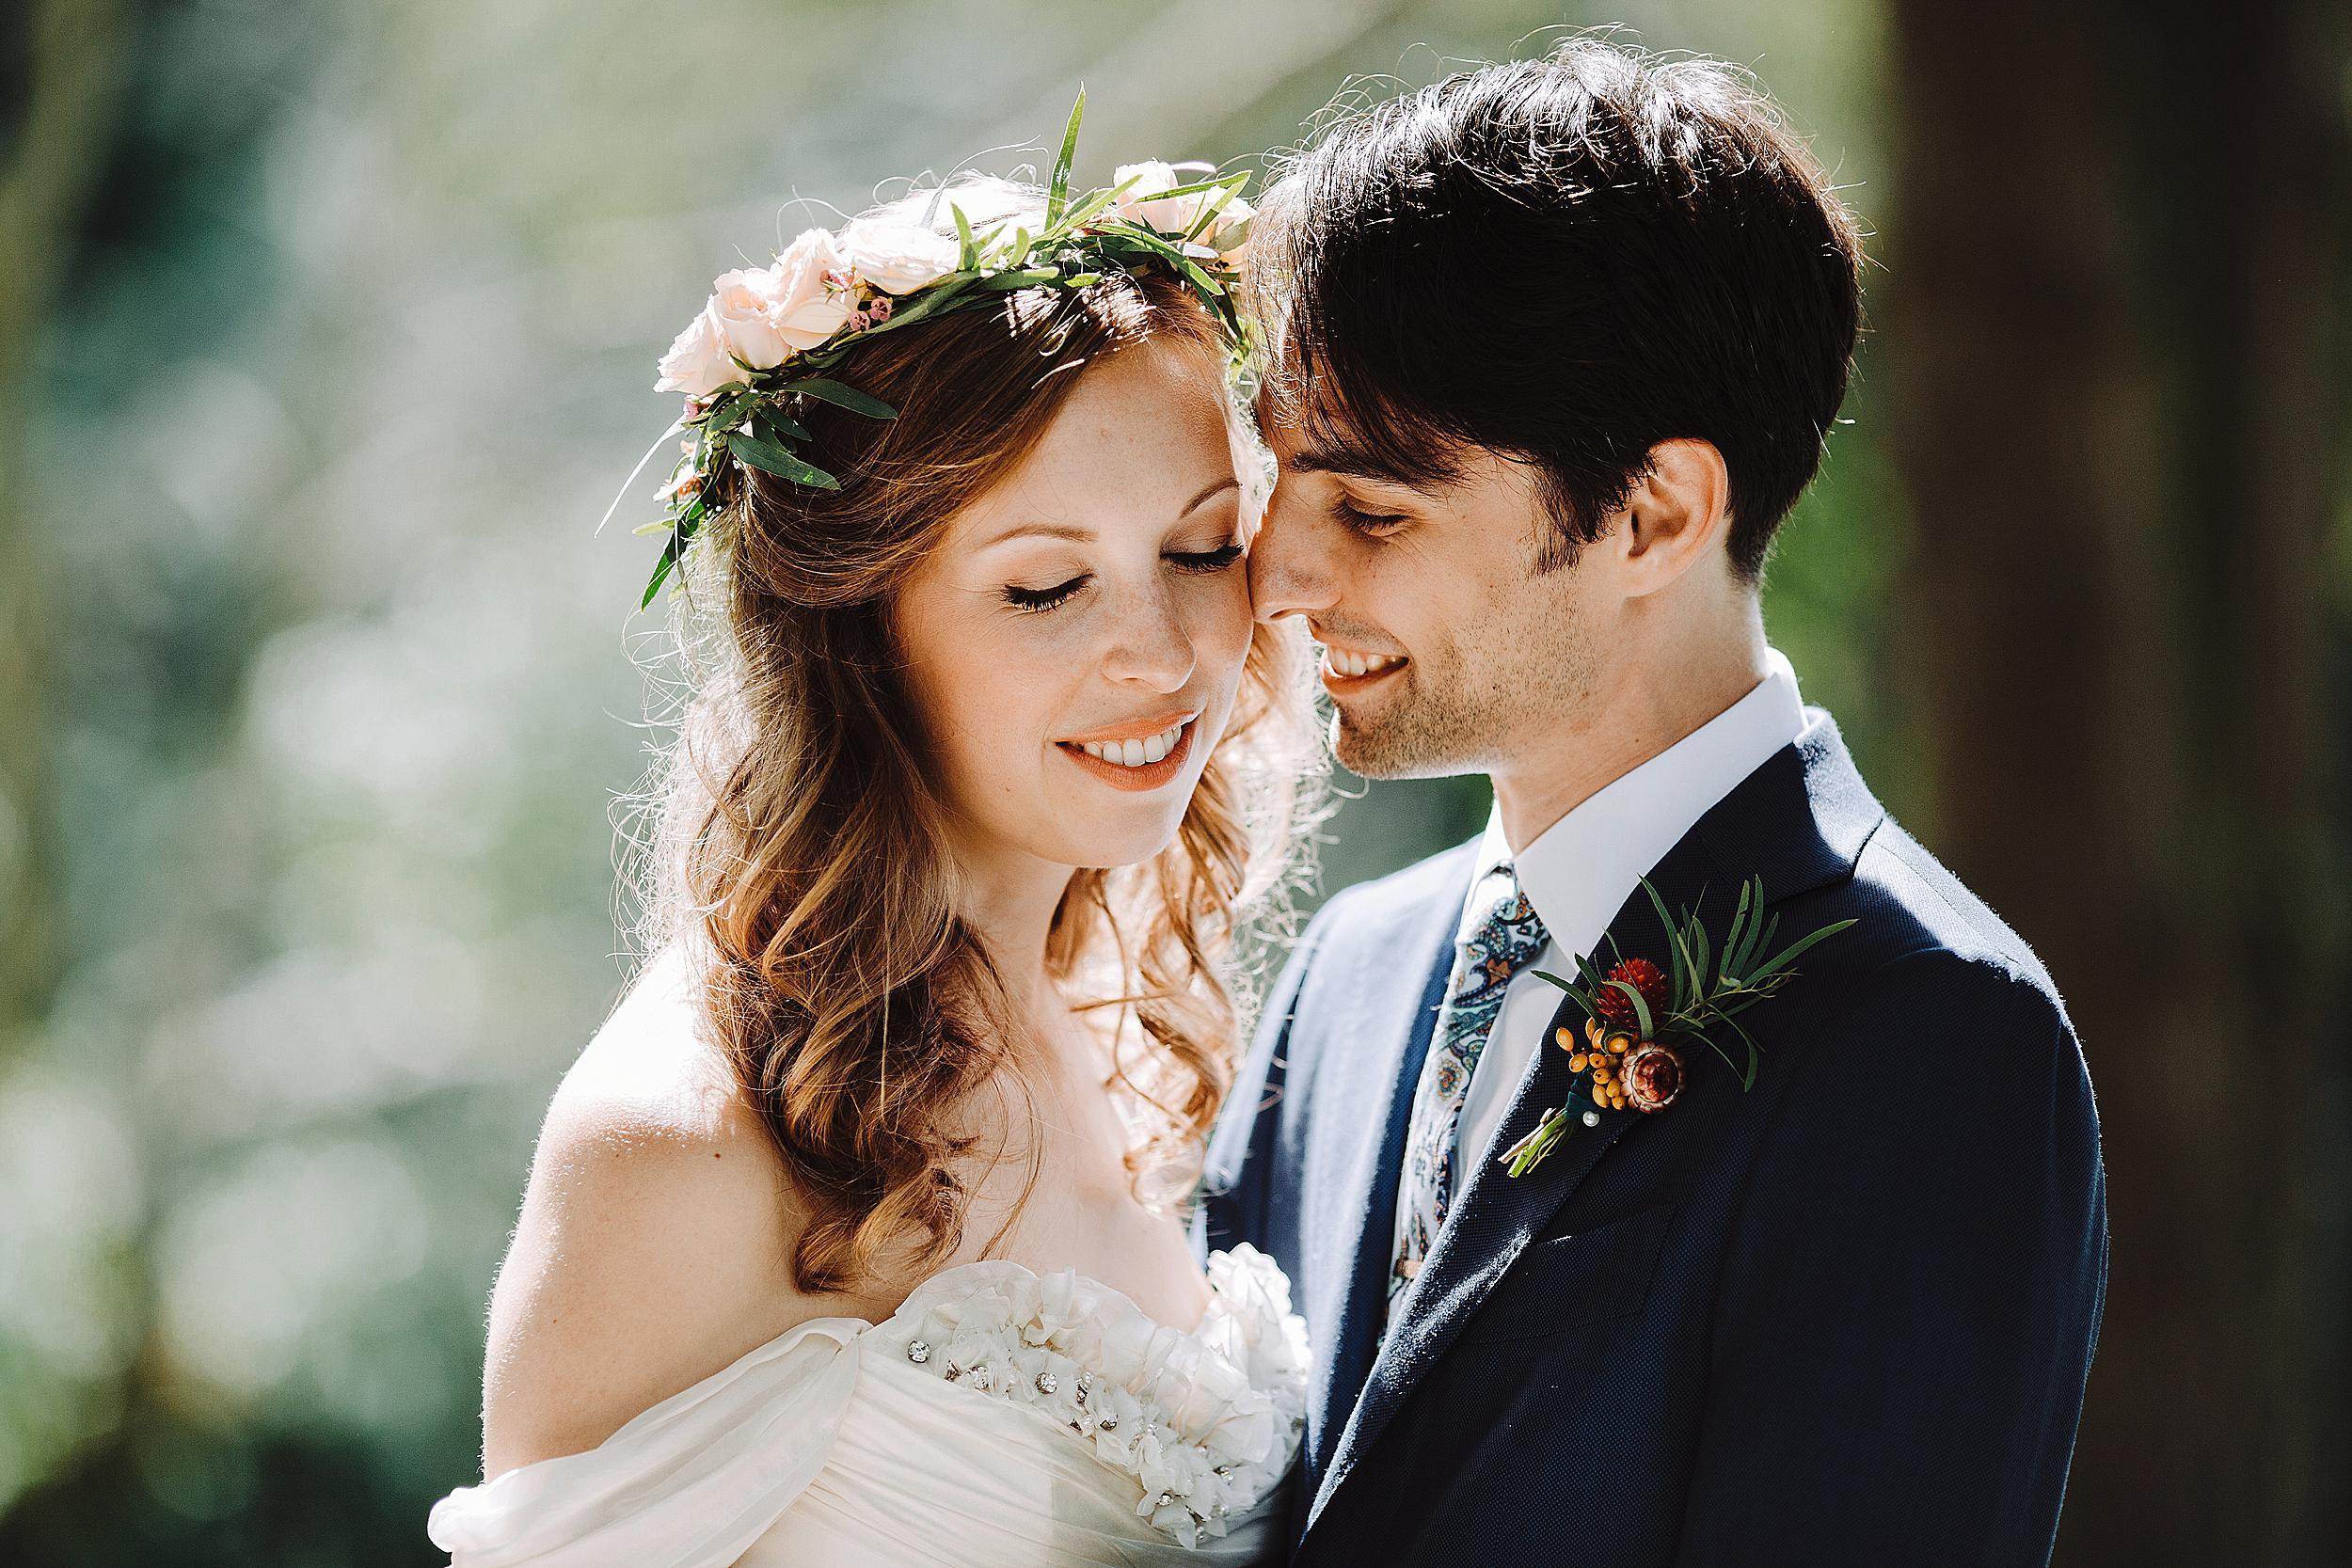 historic_shady_lane_wedding_with_love_and_embers-004.JPG